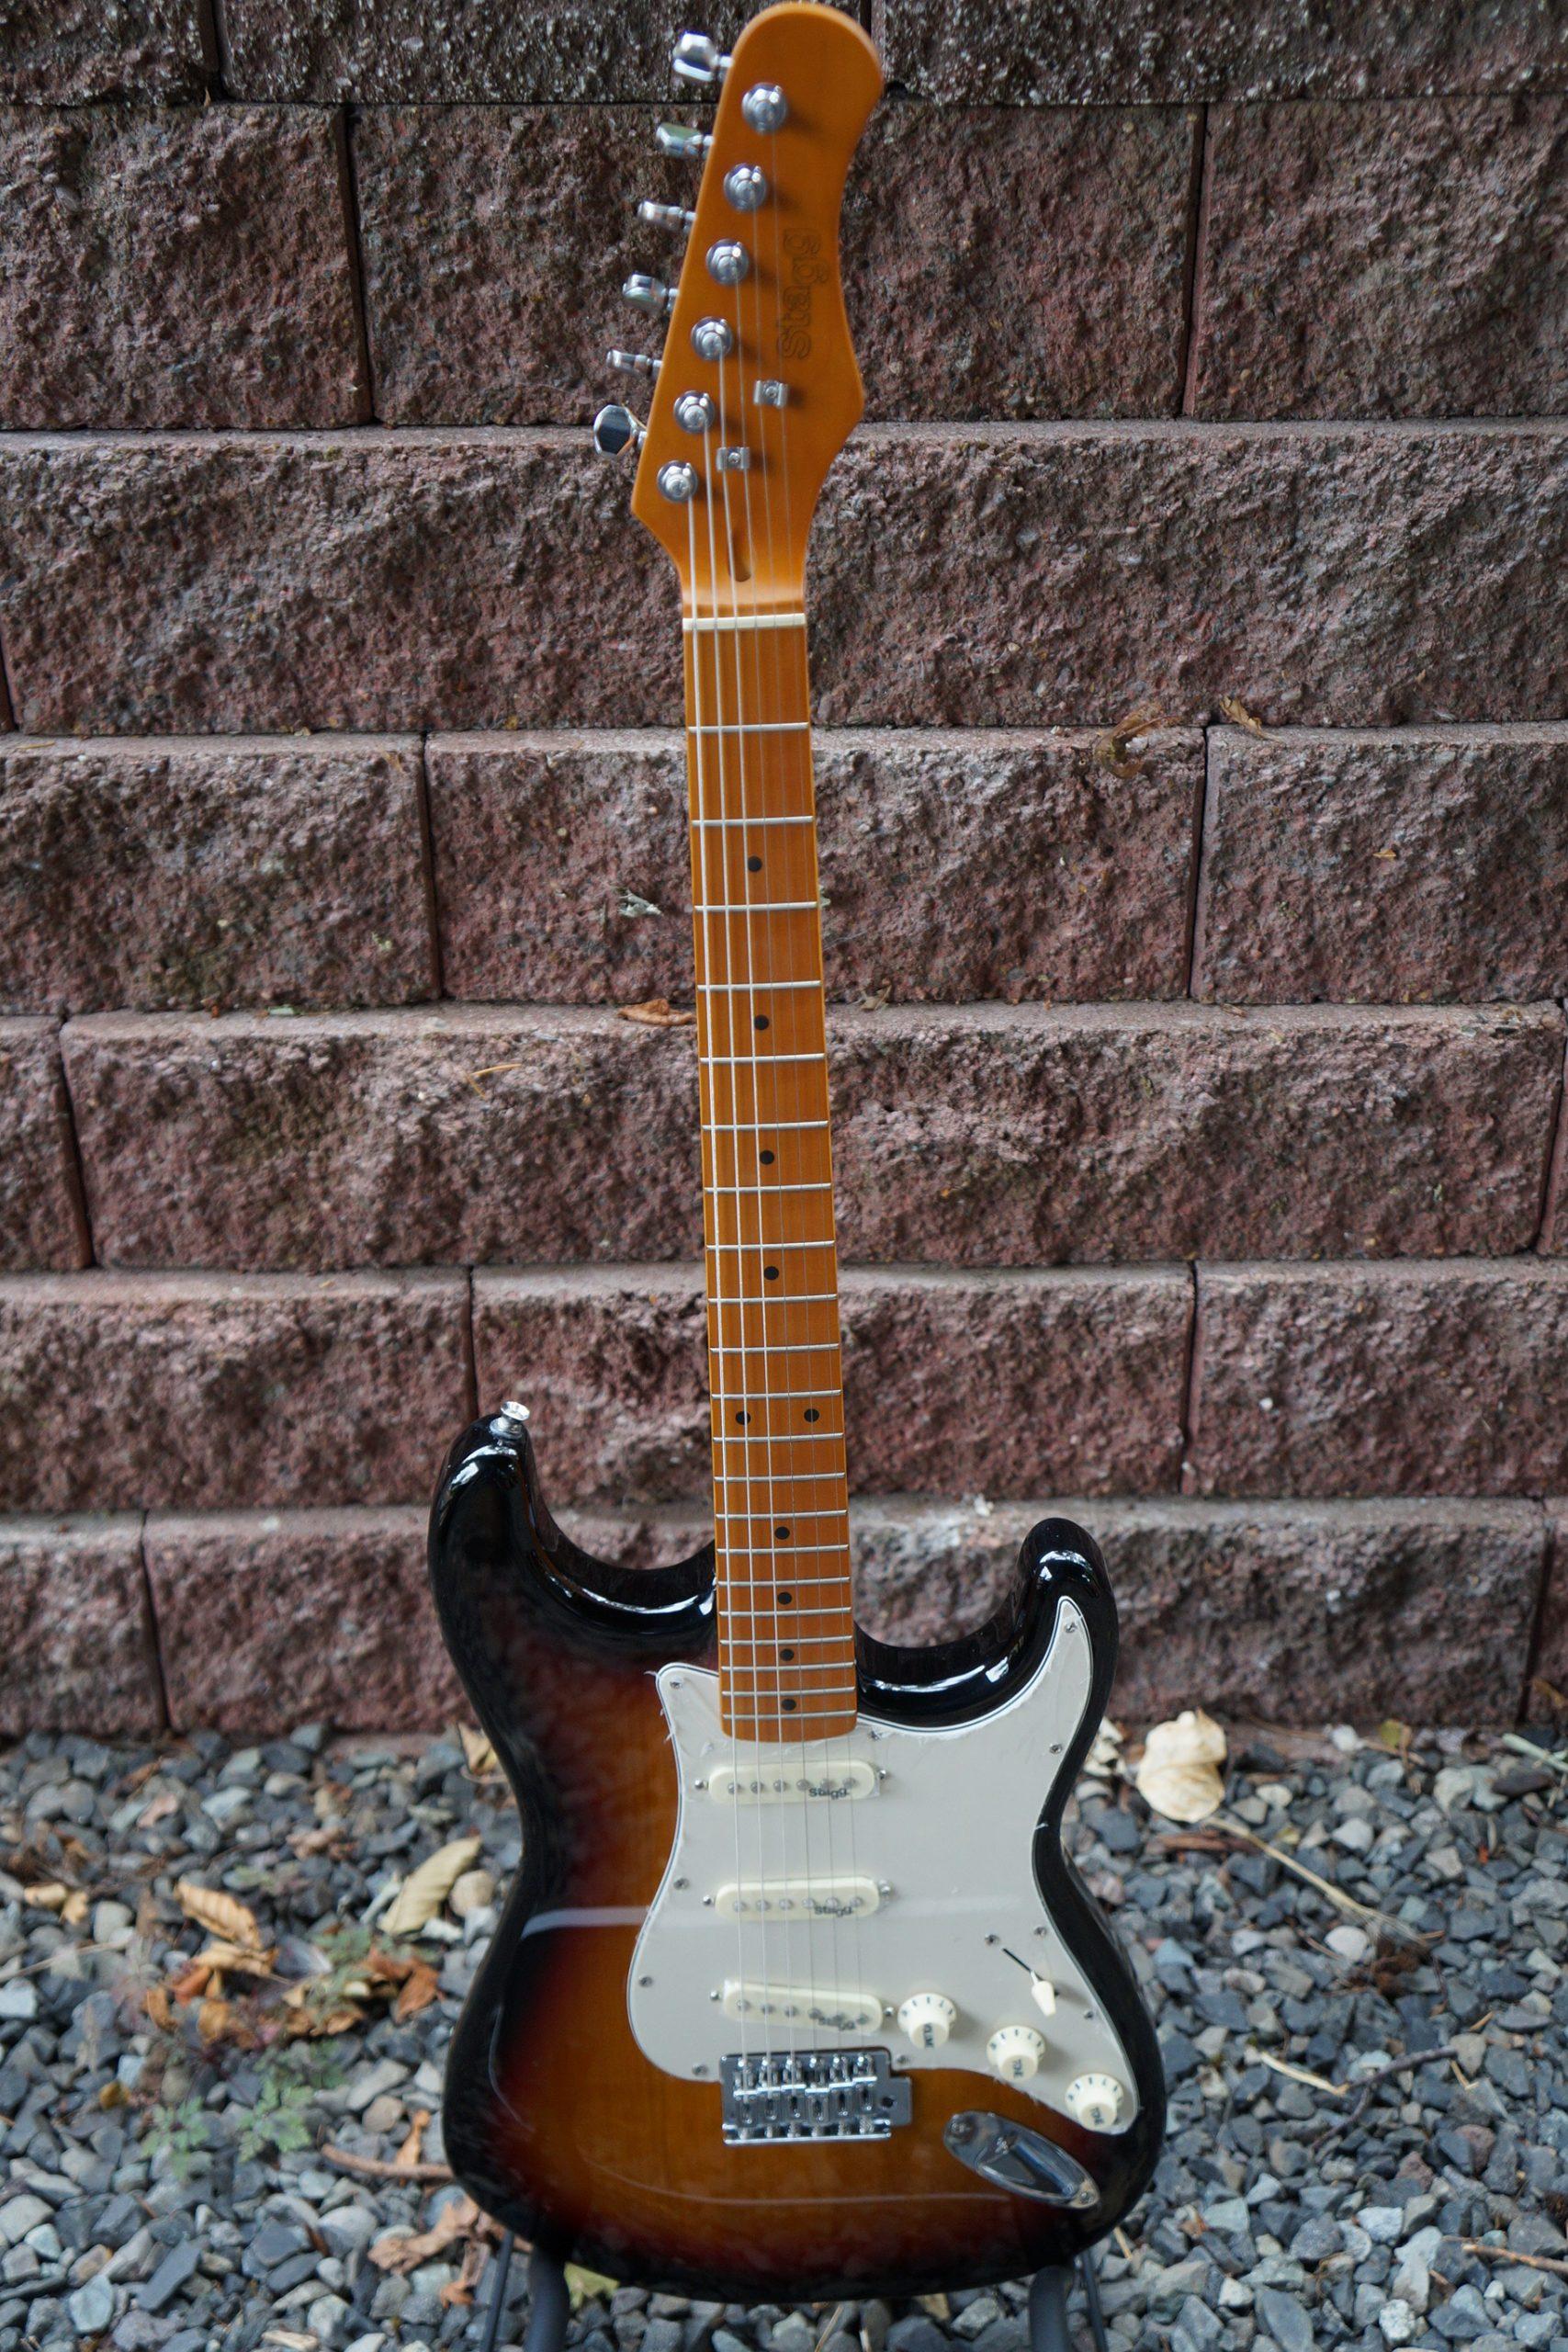 Stagg SES50M Double Cutaway Electric Guitar: Classic Vintage Sunburst Finish